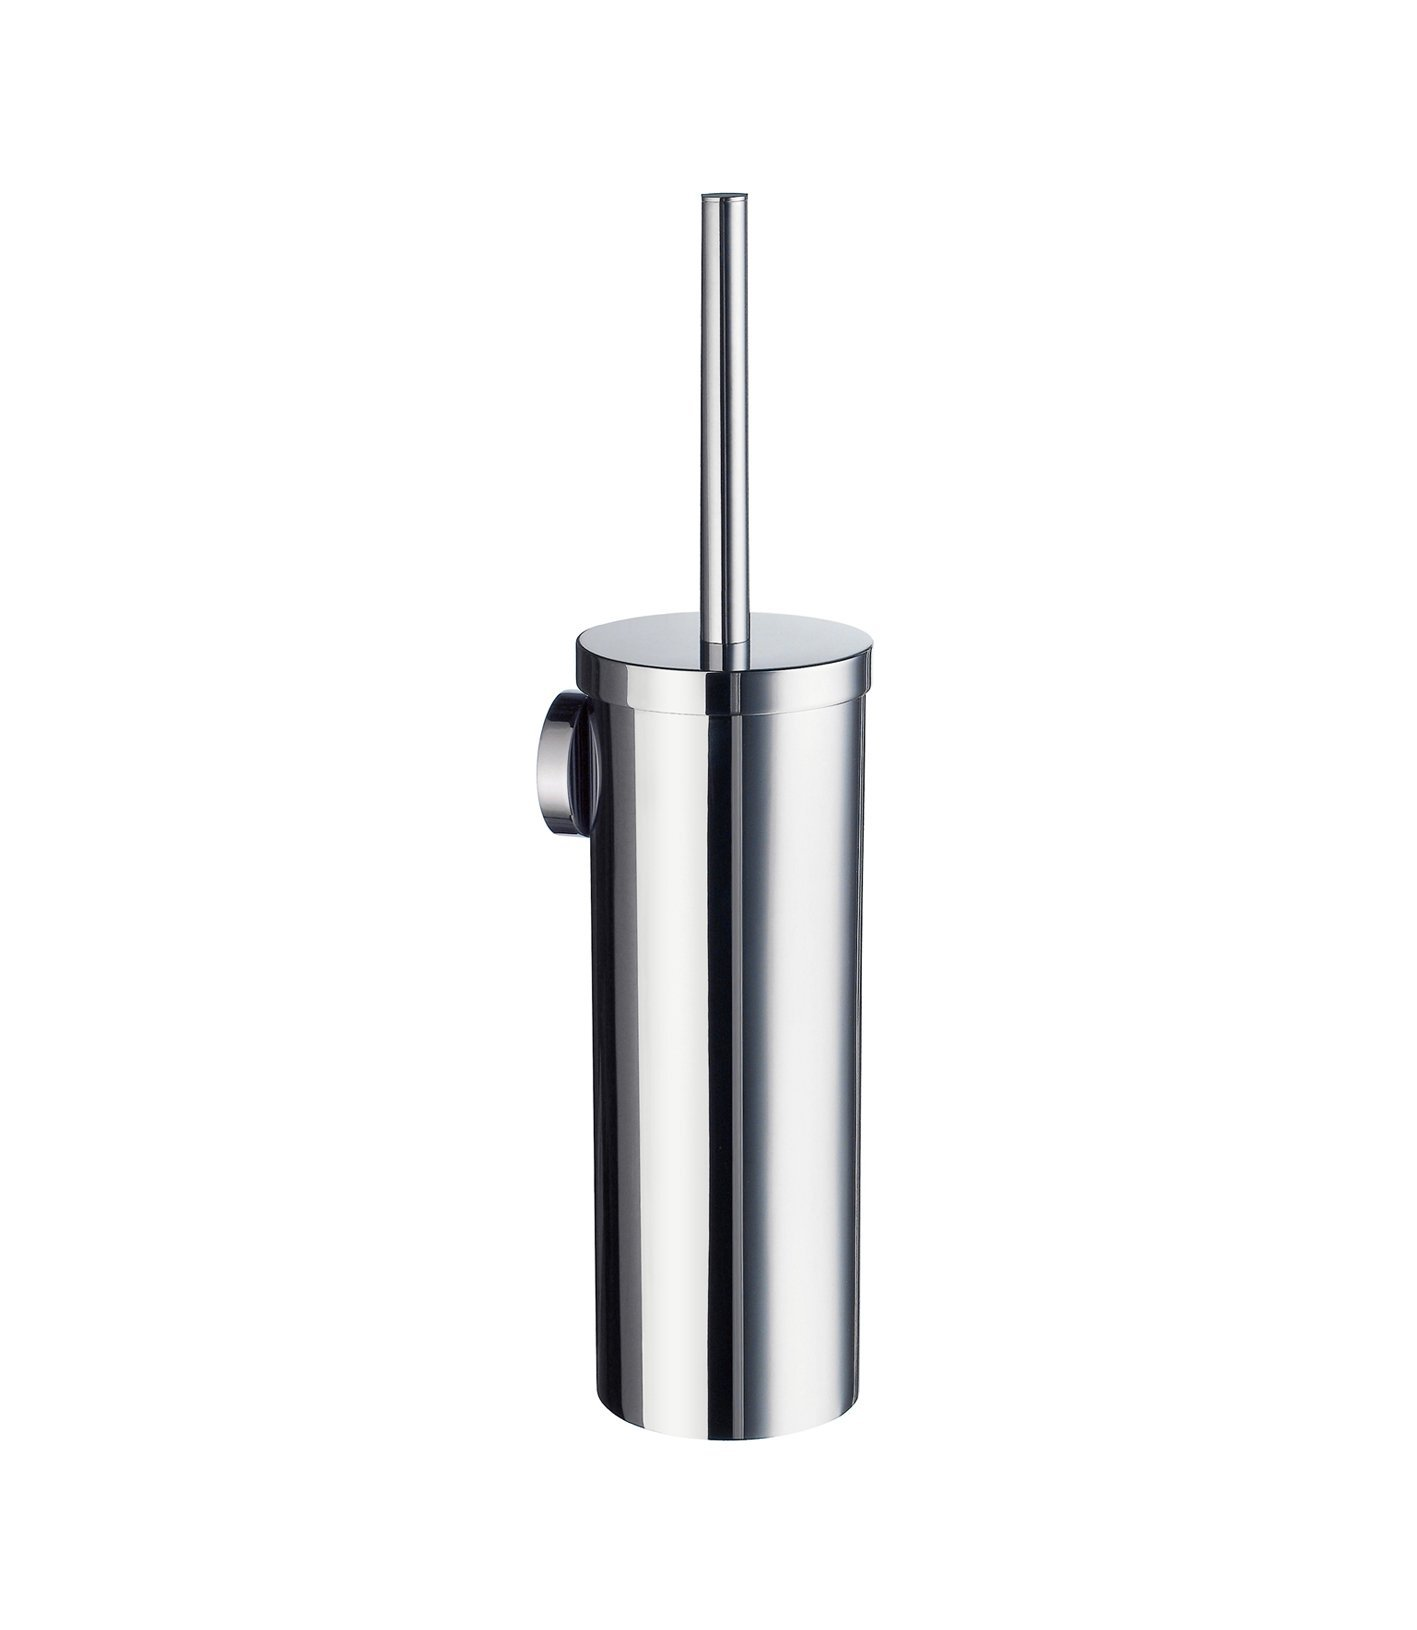 Smedbo SME HK332 Toilet Brush Wallmount, Polished Chrome